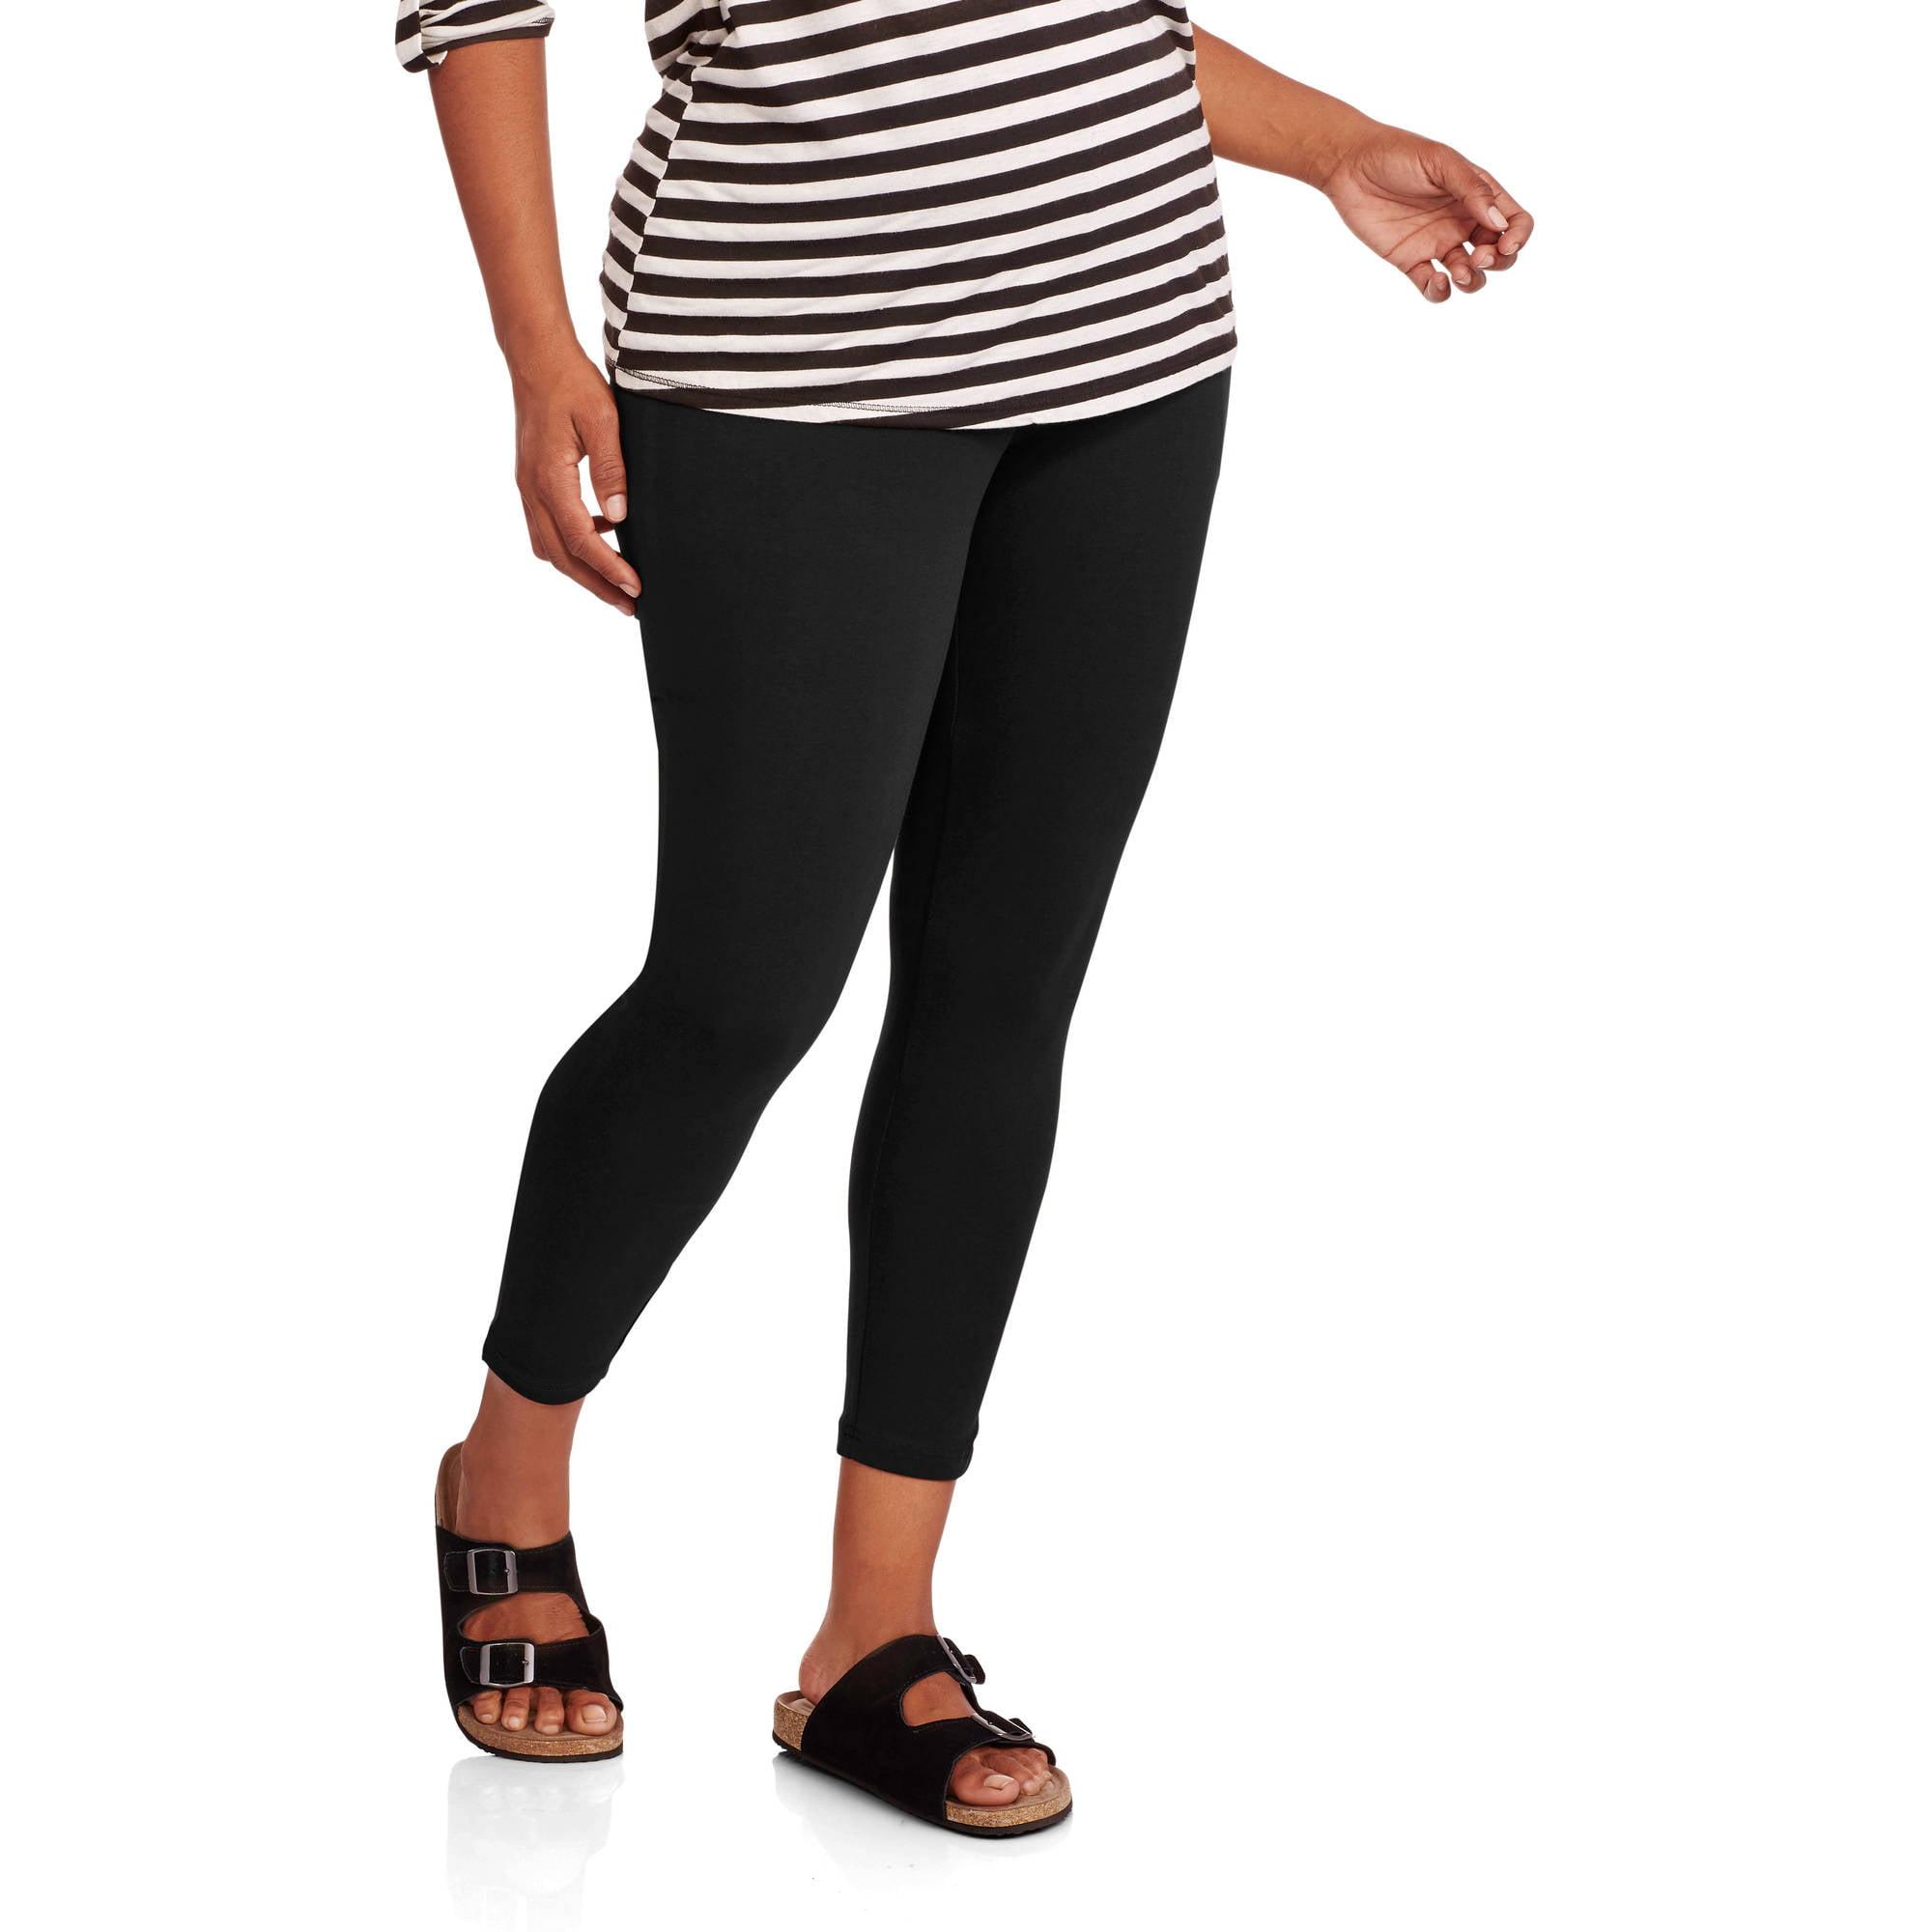 Faded Glory Women's Plus Size Essential Leggings